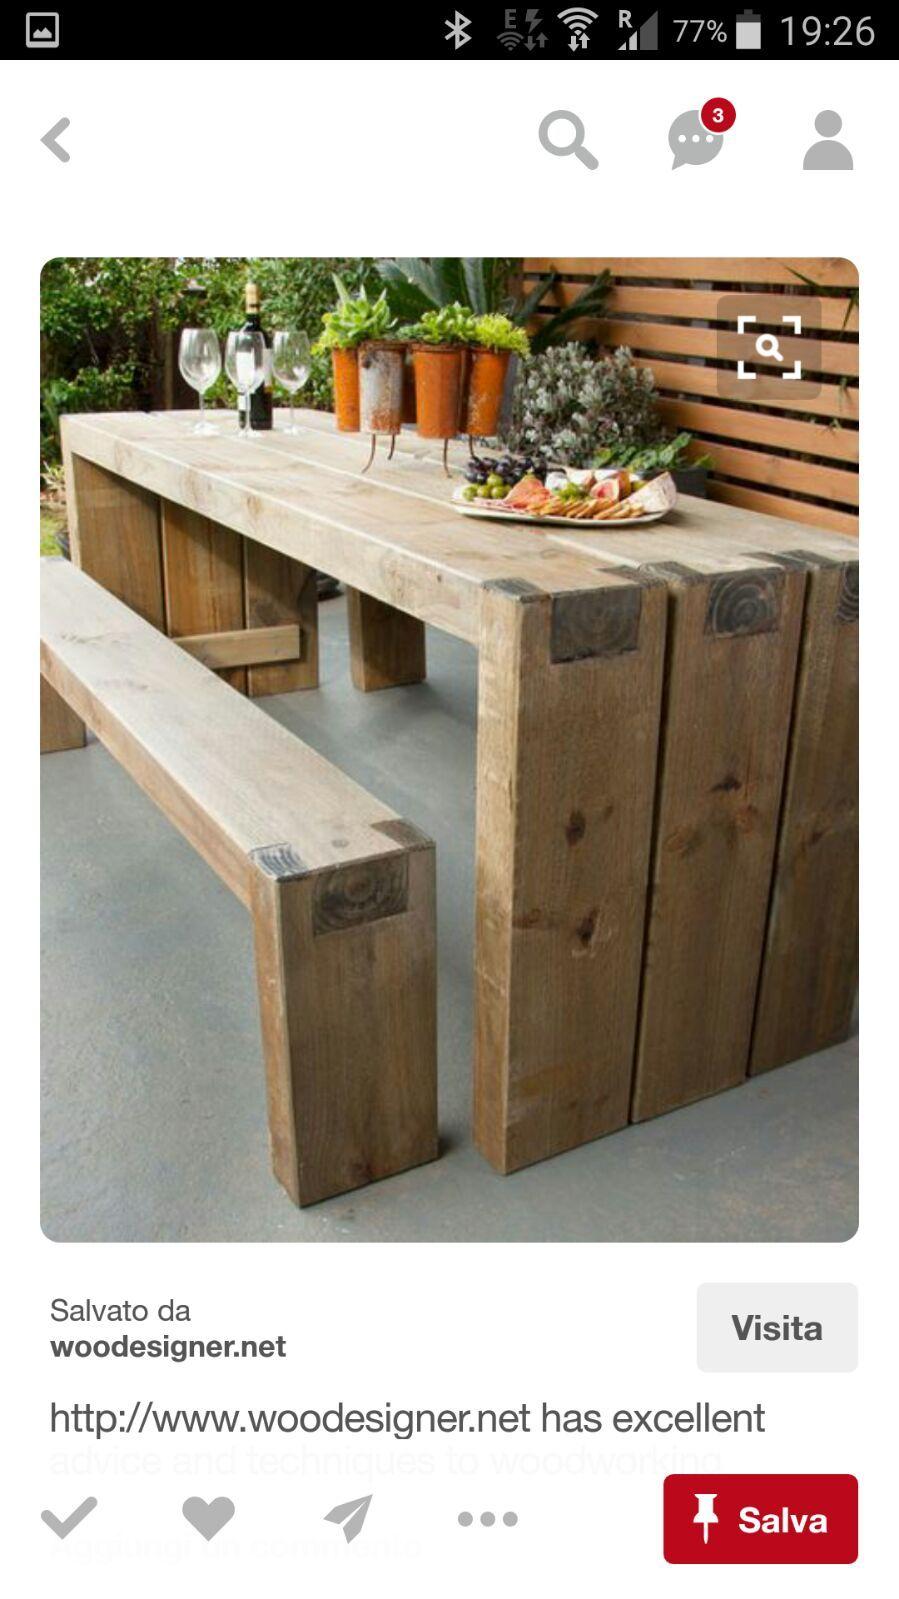 Out door furniture wooden garden furniture house furniture patio furniture covers backyard